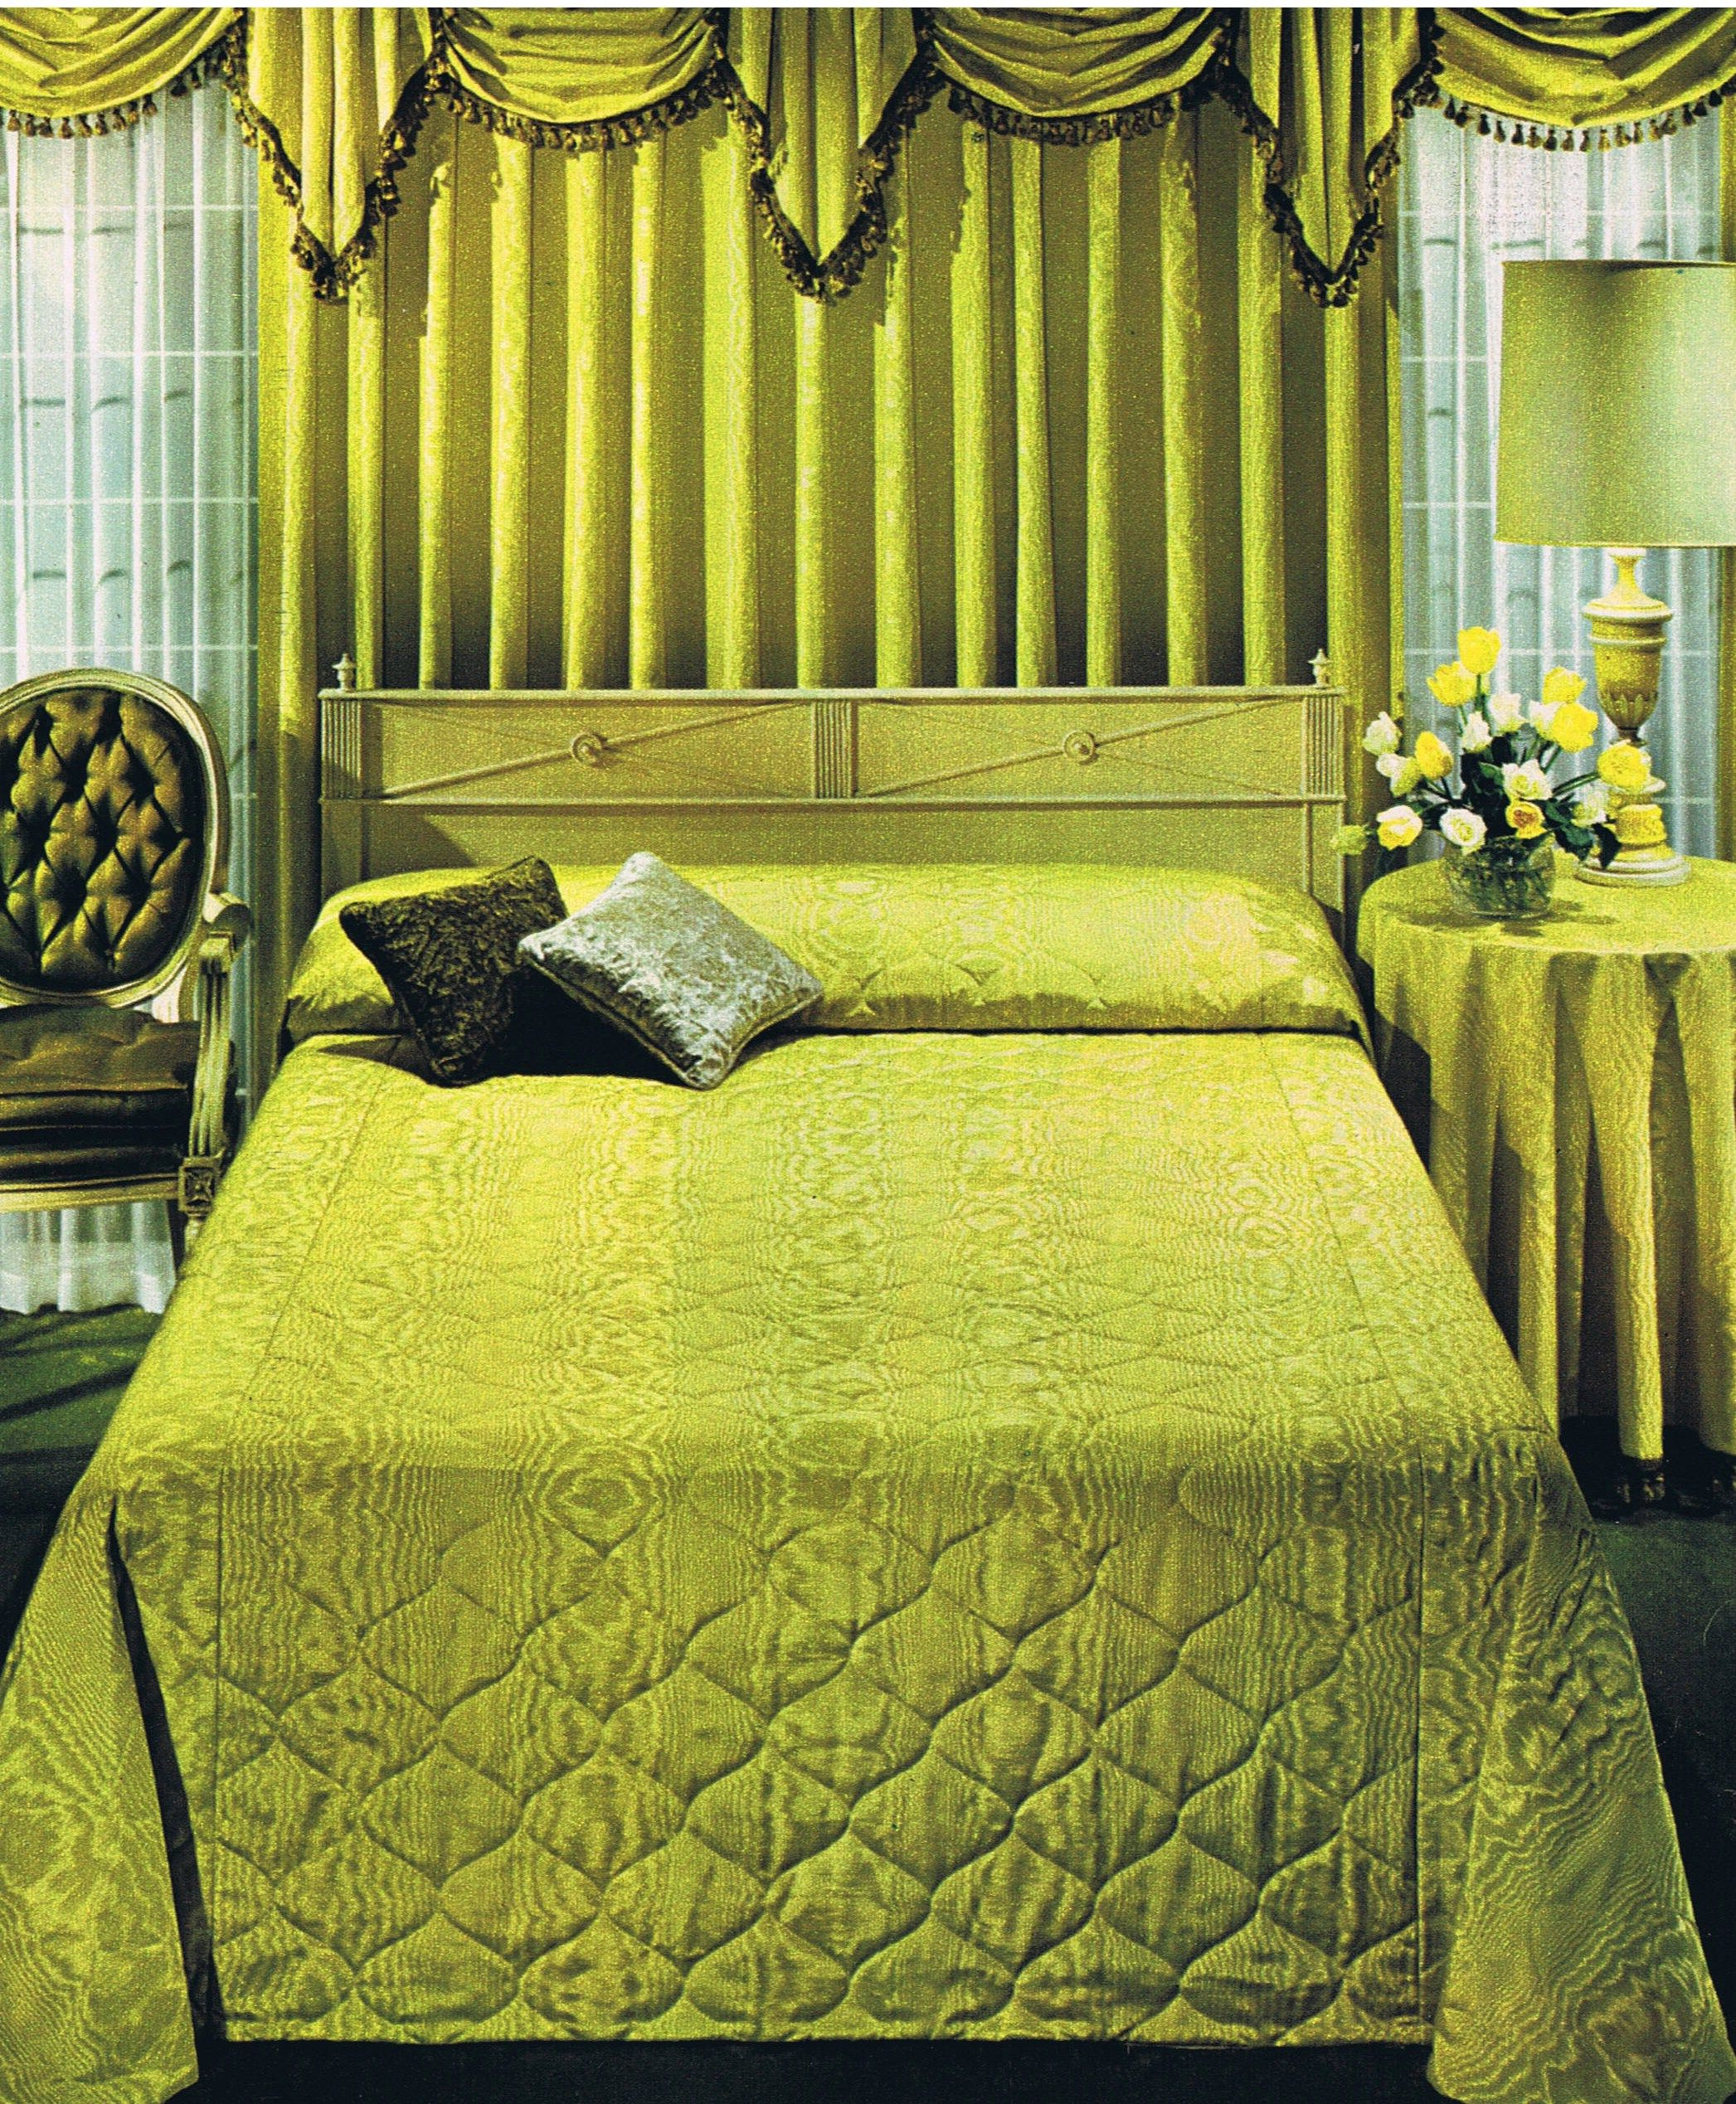 Pin By Astrid Dalton On Home Hollywood Regency Bedroom Bedroom Vintage Retro Room